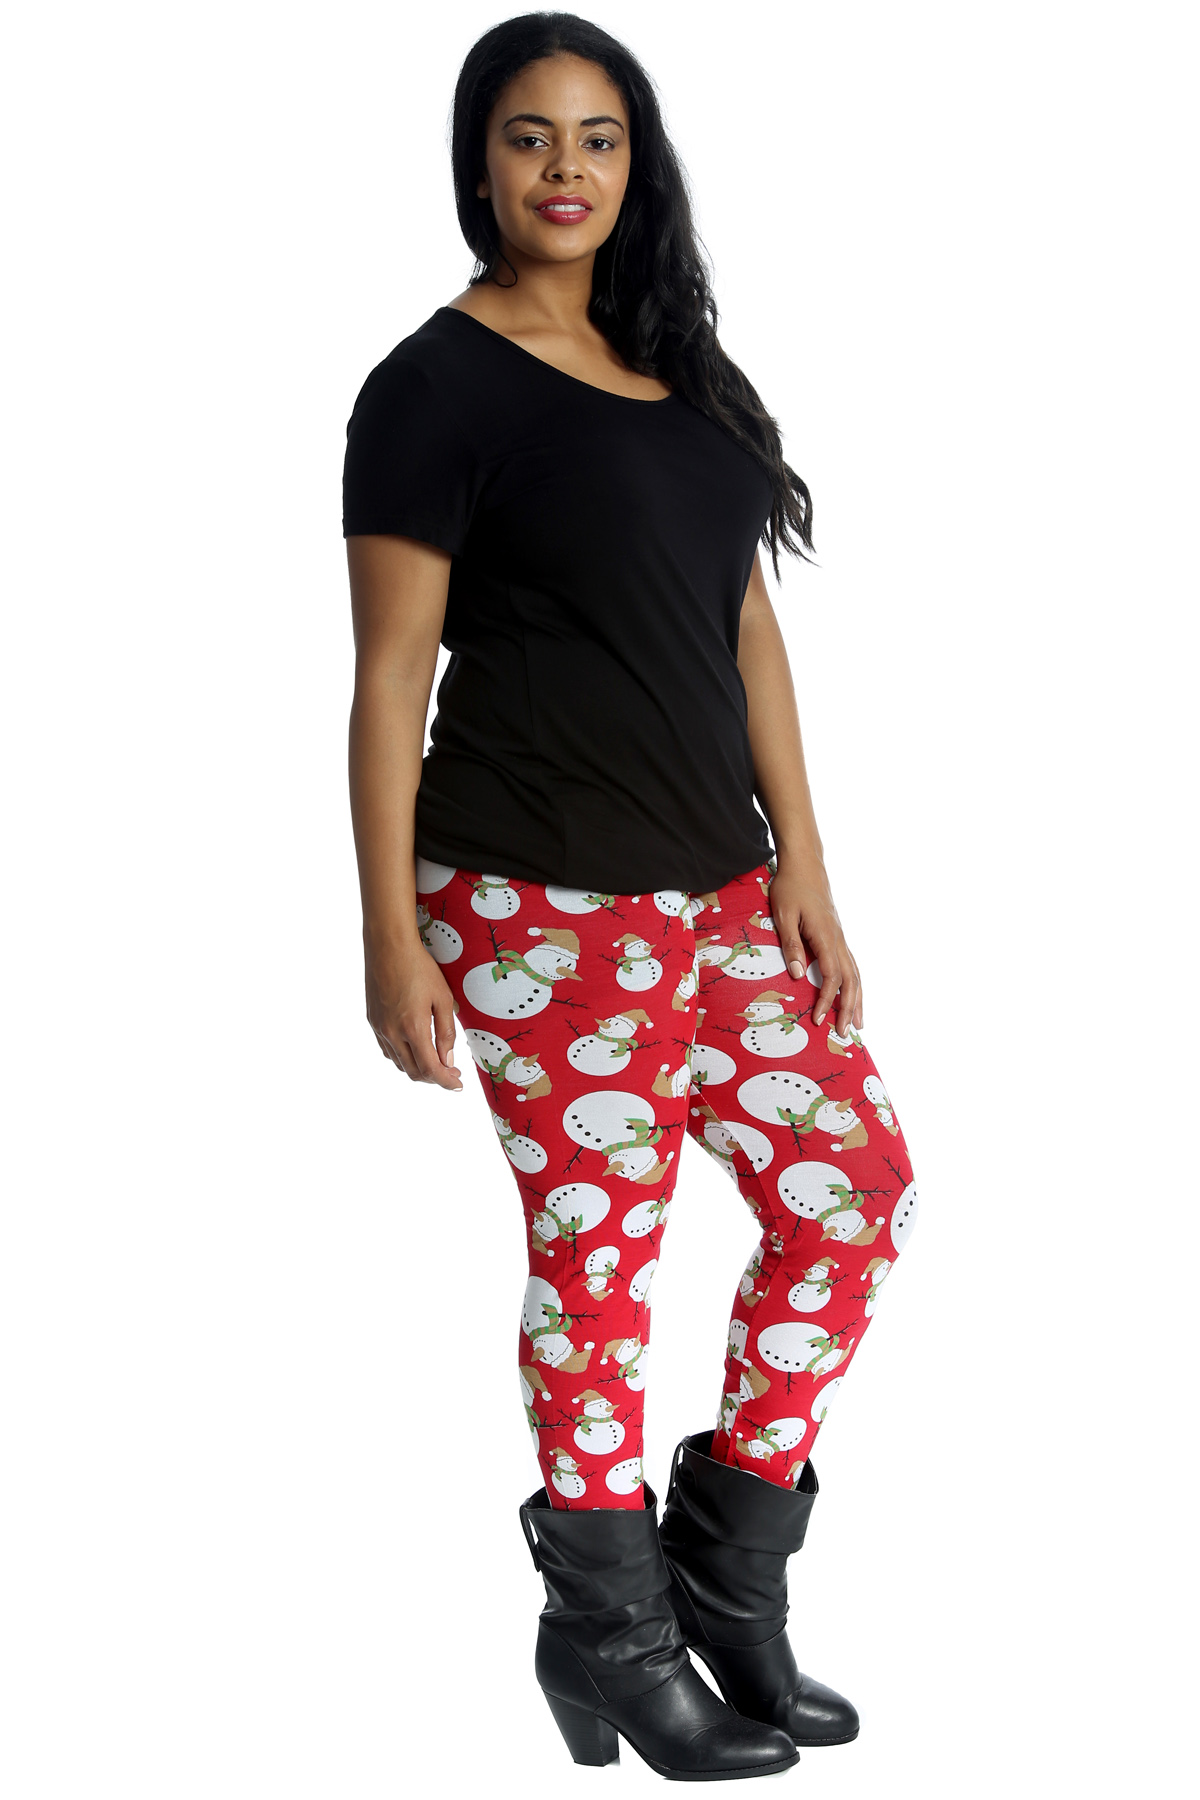 neue damen bergr en leggings schneemann frauen druck. Black Bedroom Furniture Sets. Home Design Ideas